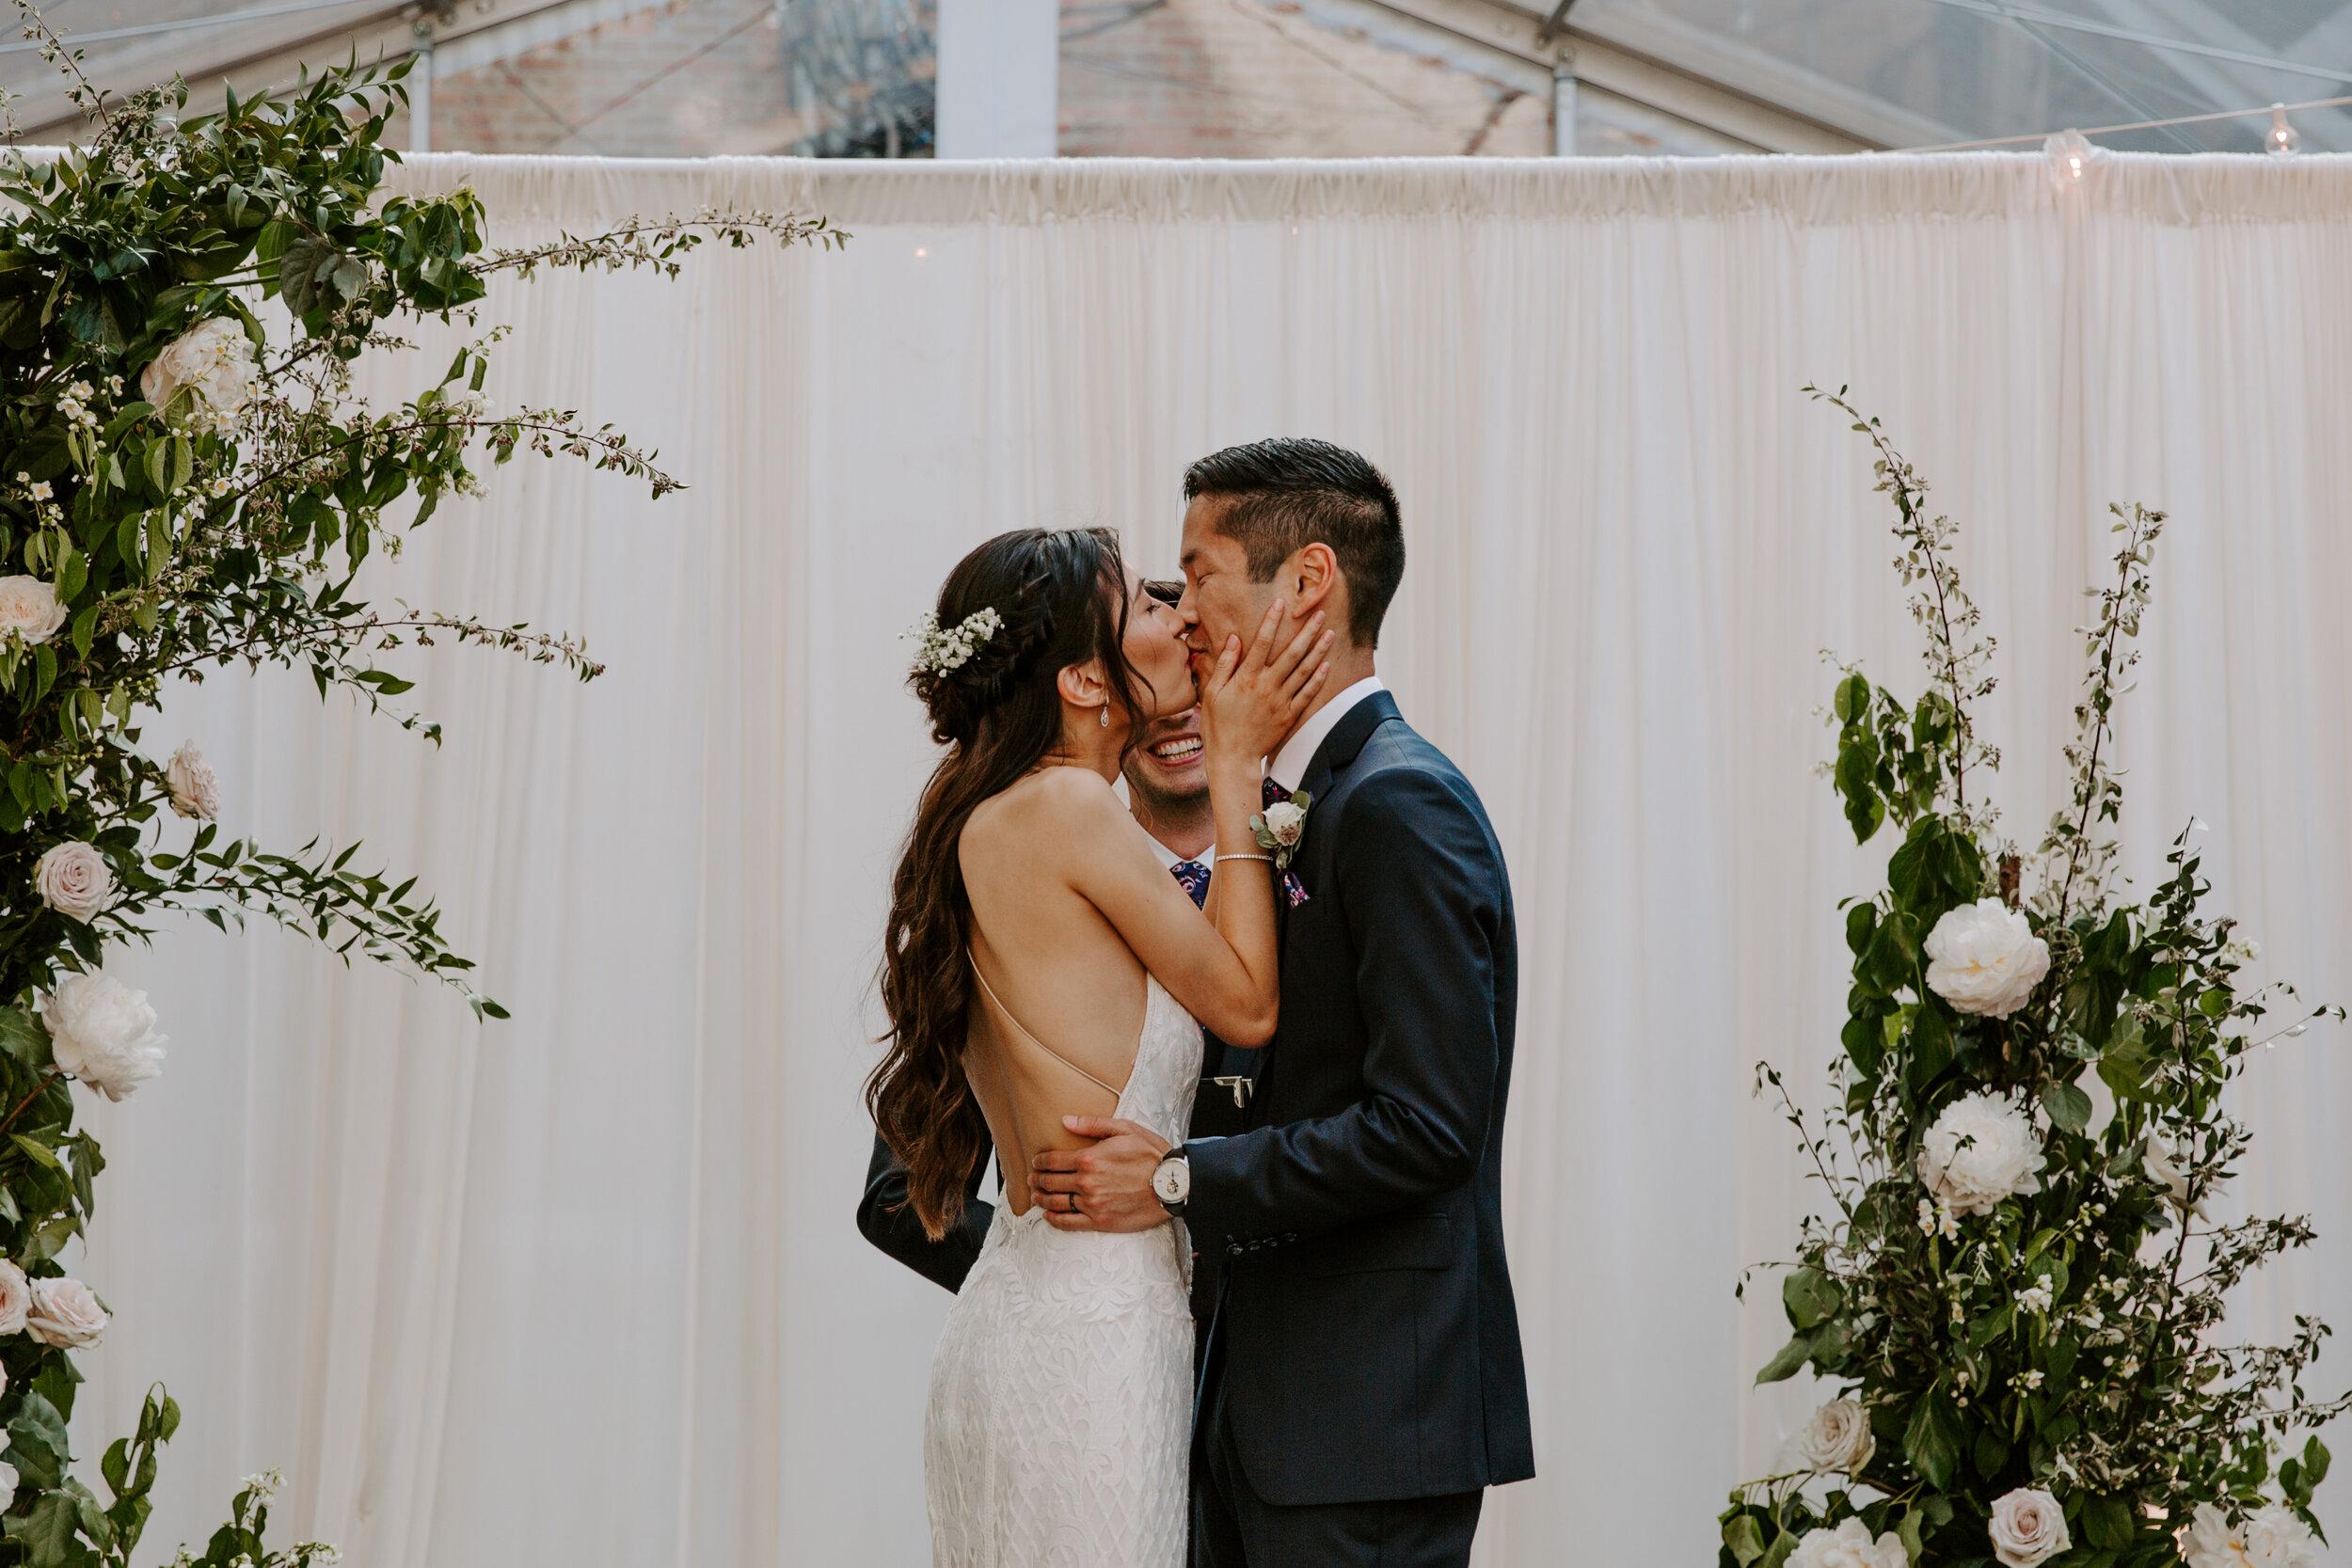 quan wedding-246.jpg